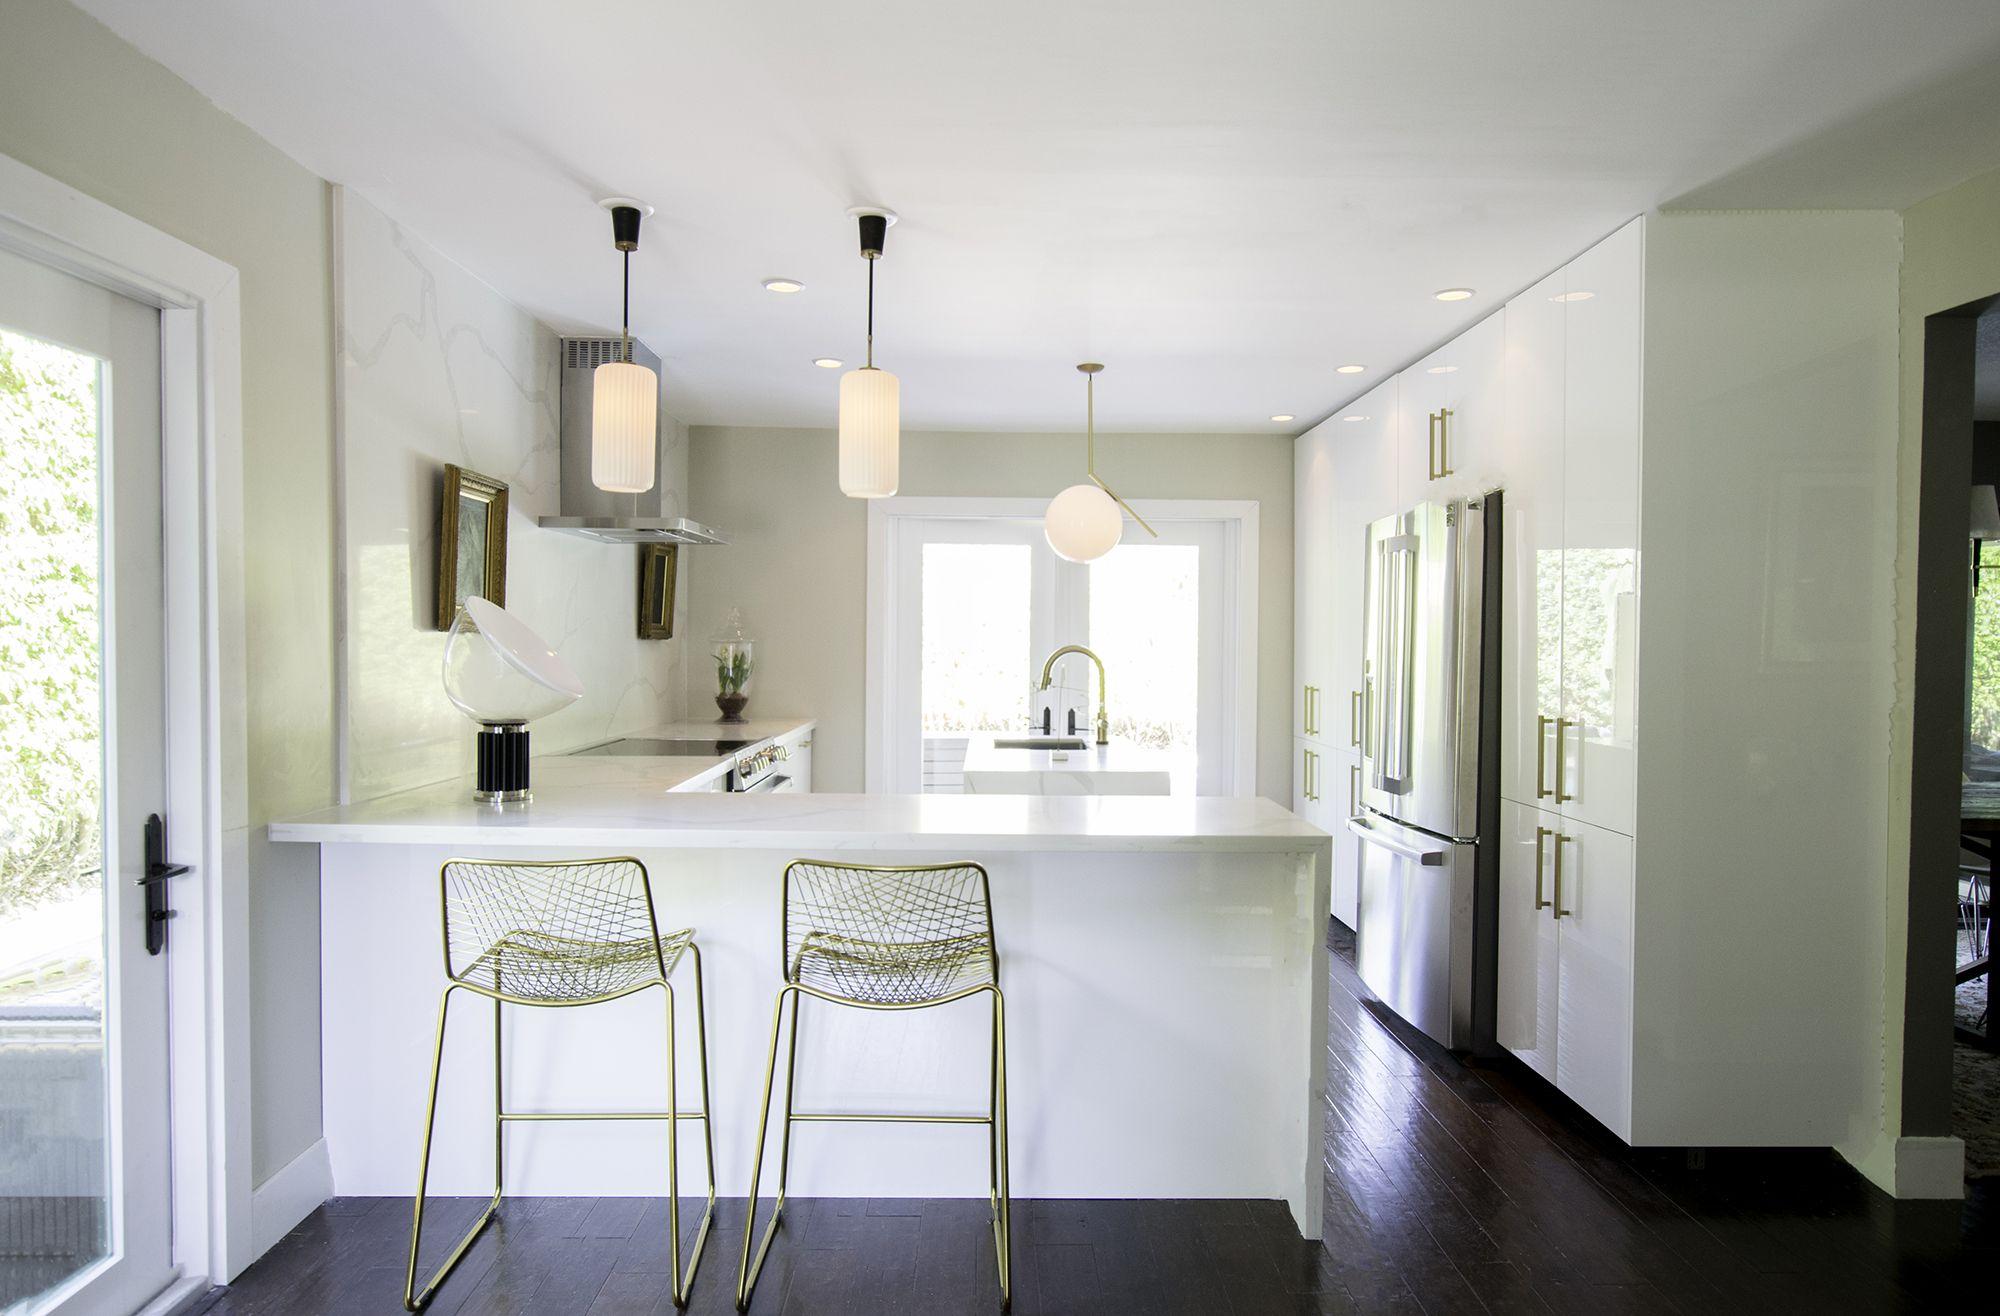 Wondrous Kitchen Peninsula Ideas 34 Gorgeous And Functional Kitchen Pdpeps Interior Chair Design Pdpepsorg